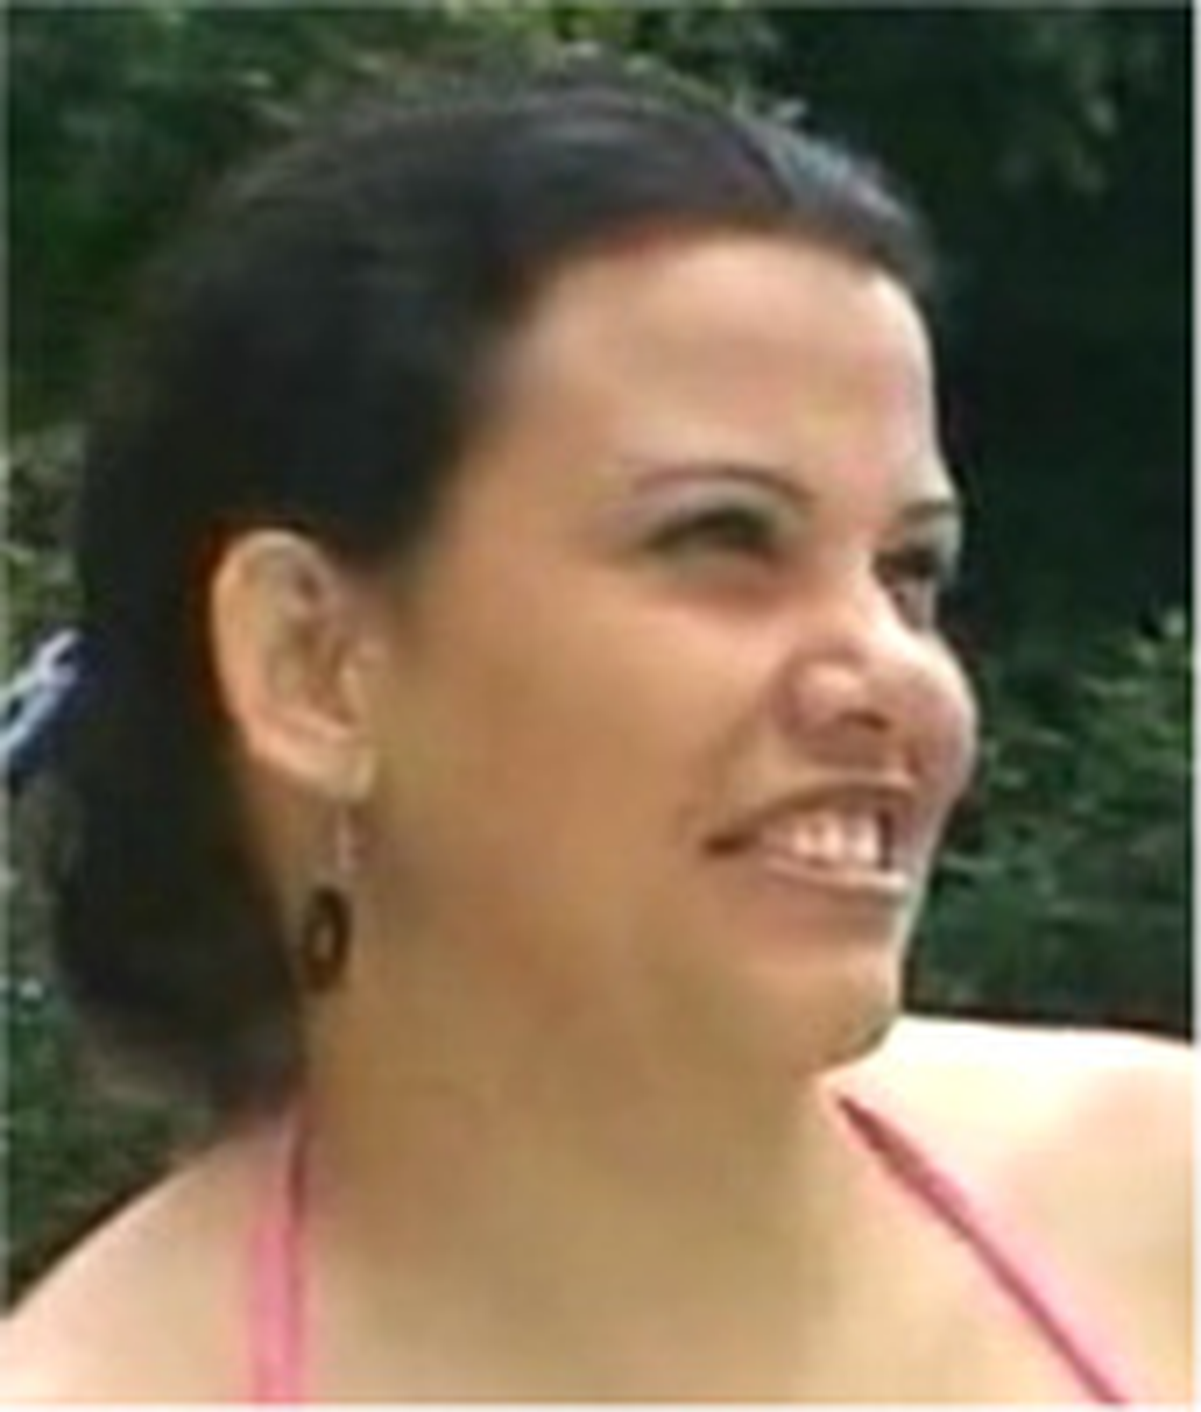 Iohana Alvez